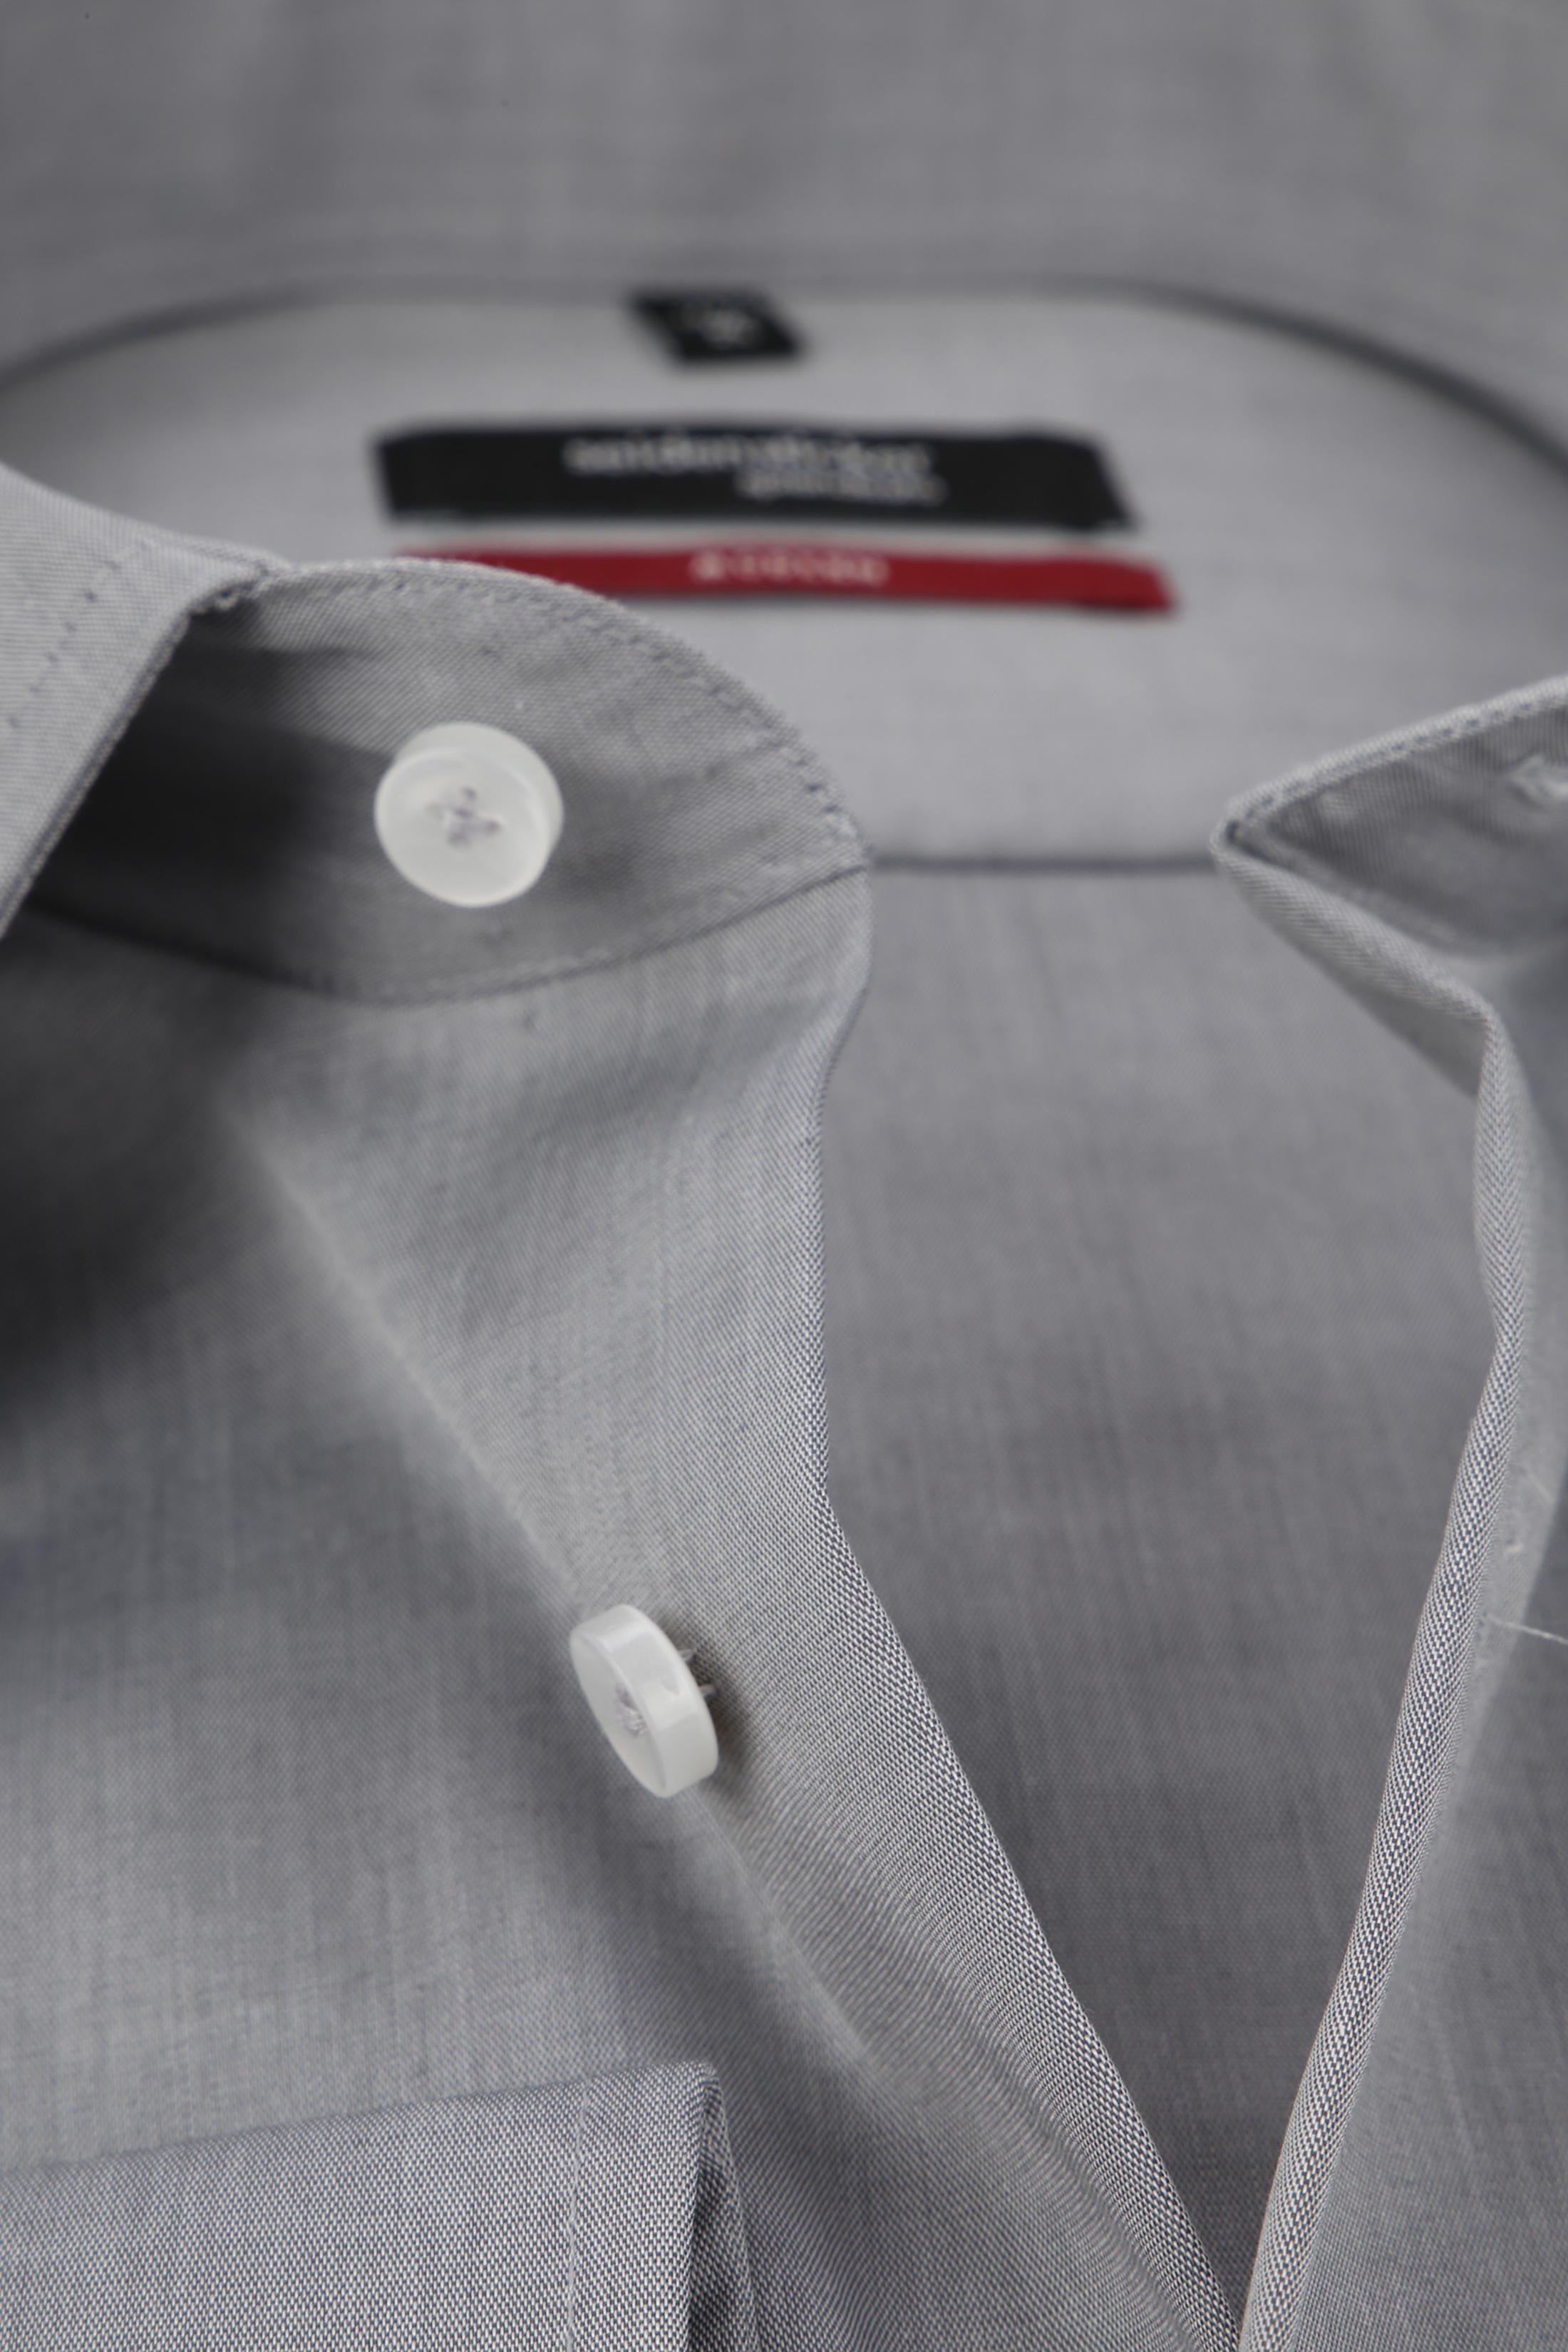 Seidensticker Strijkvrij Overhemd Grijs foto 1